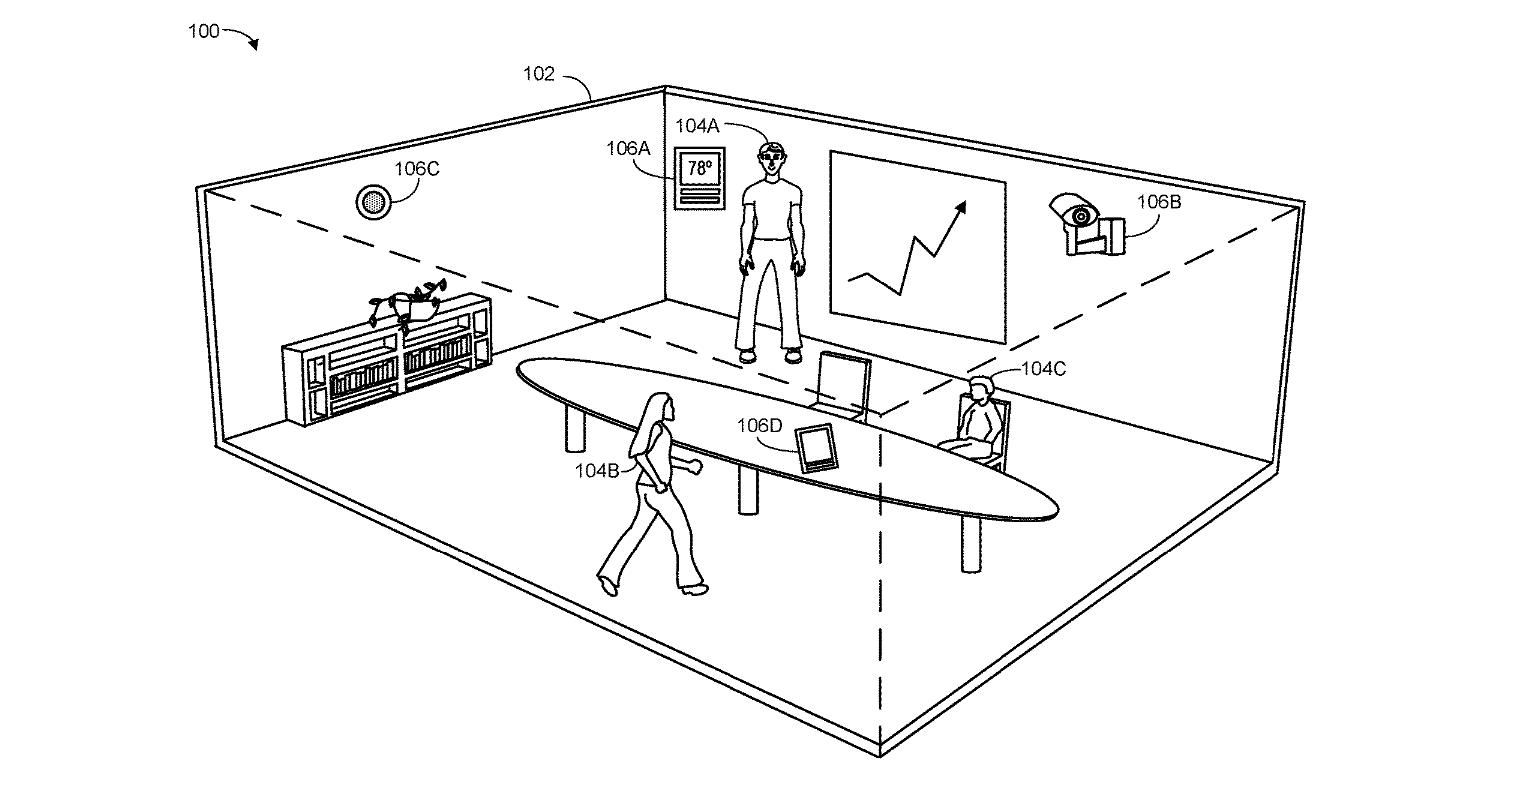 Screenshot 2020 12 05 12 03 51 - Microsoft has filed an Orwellian patent